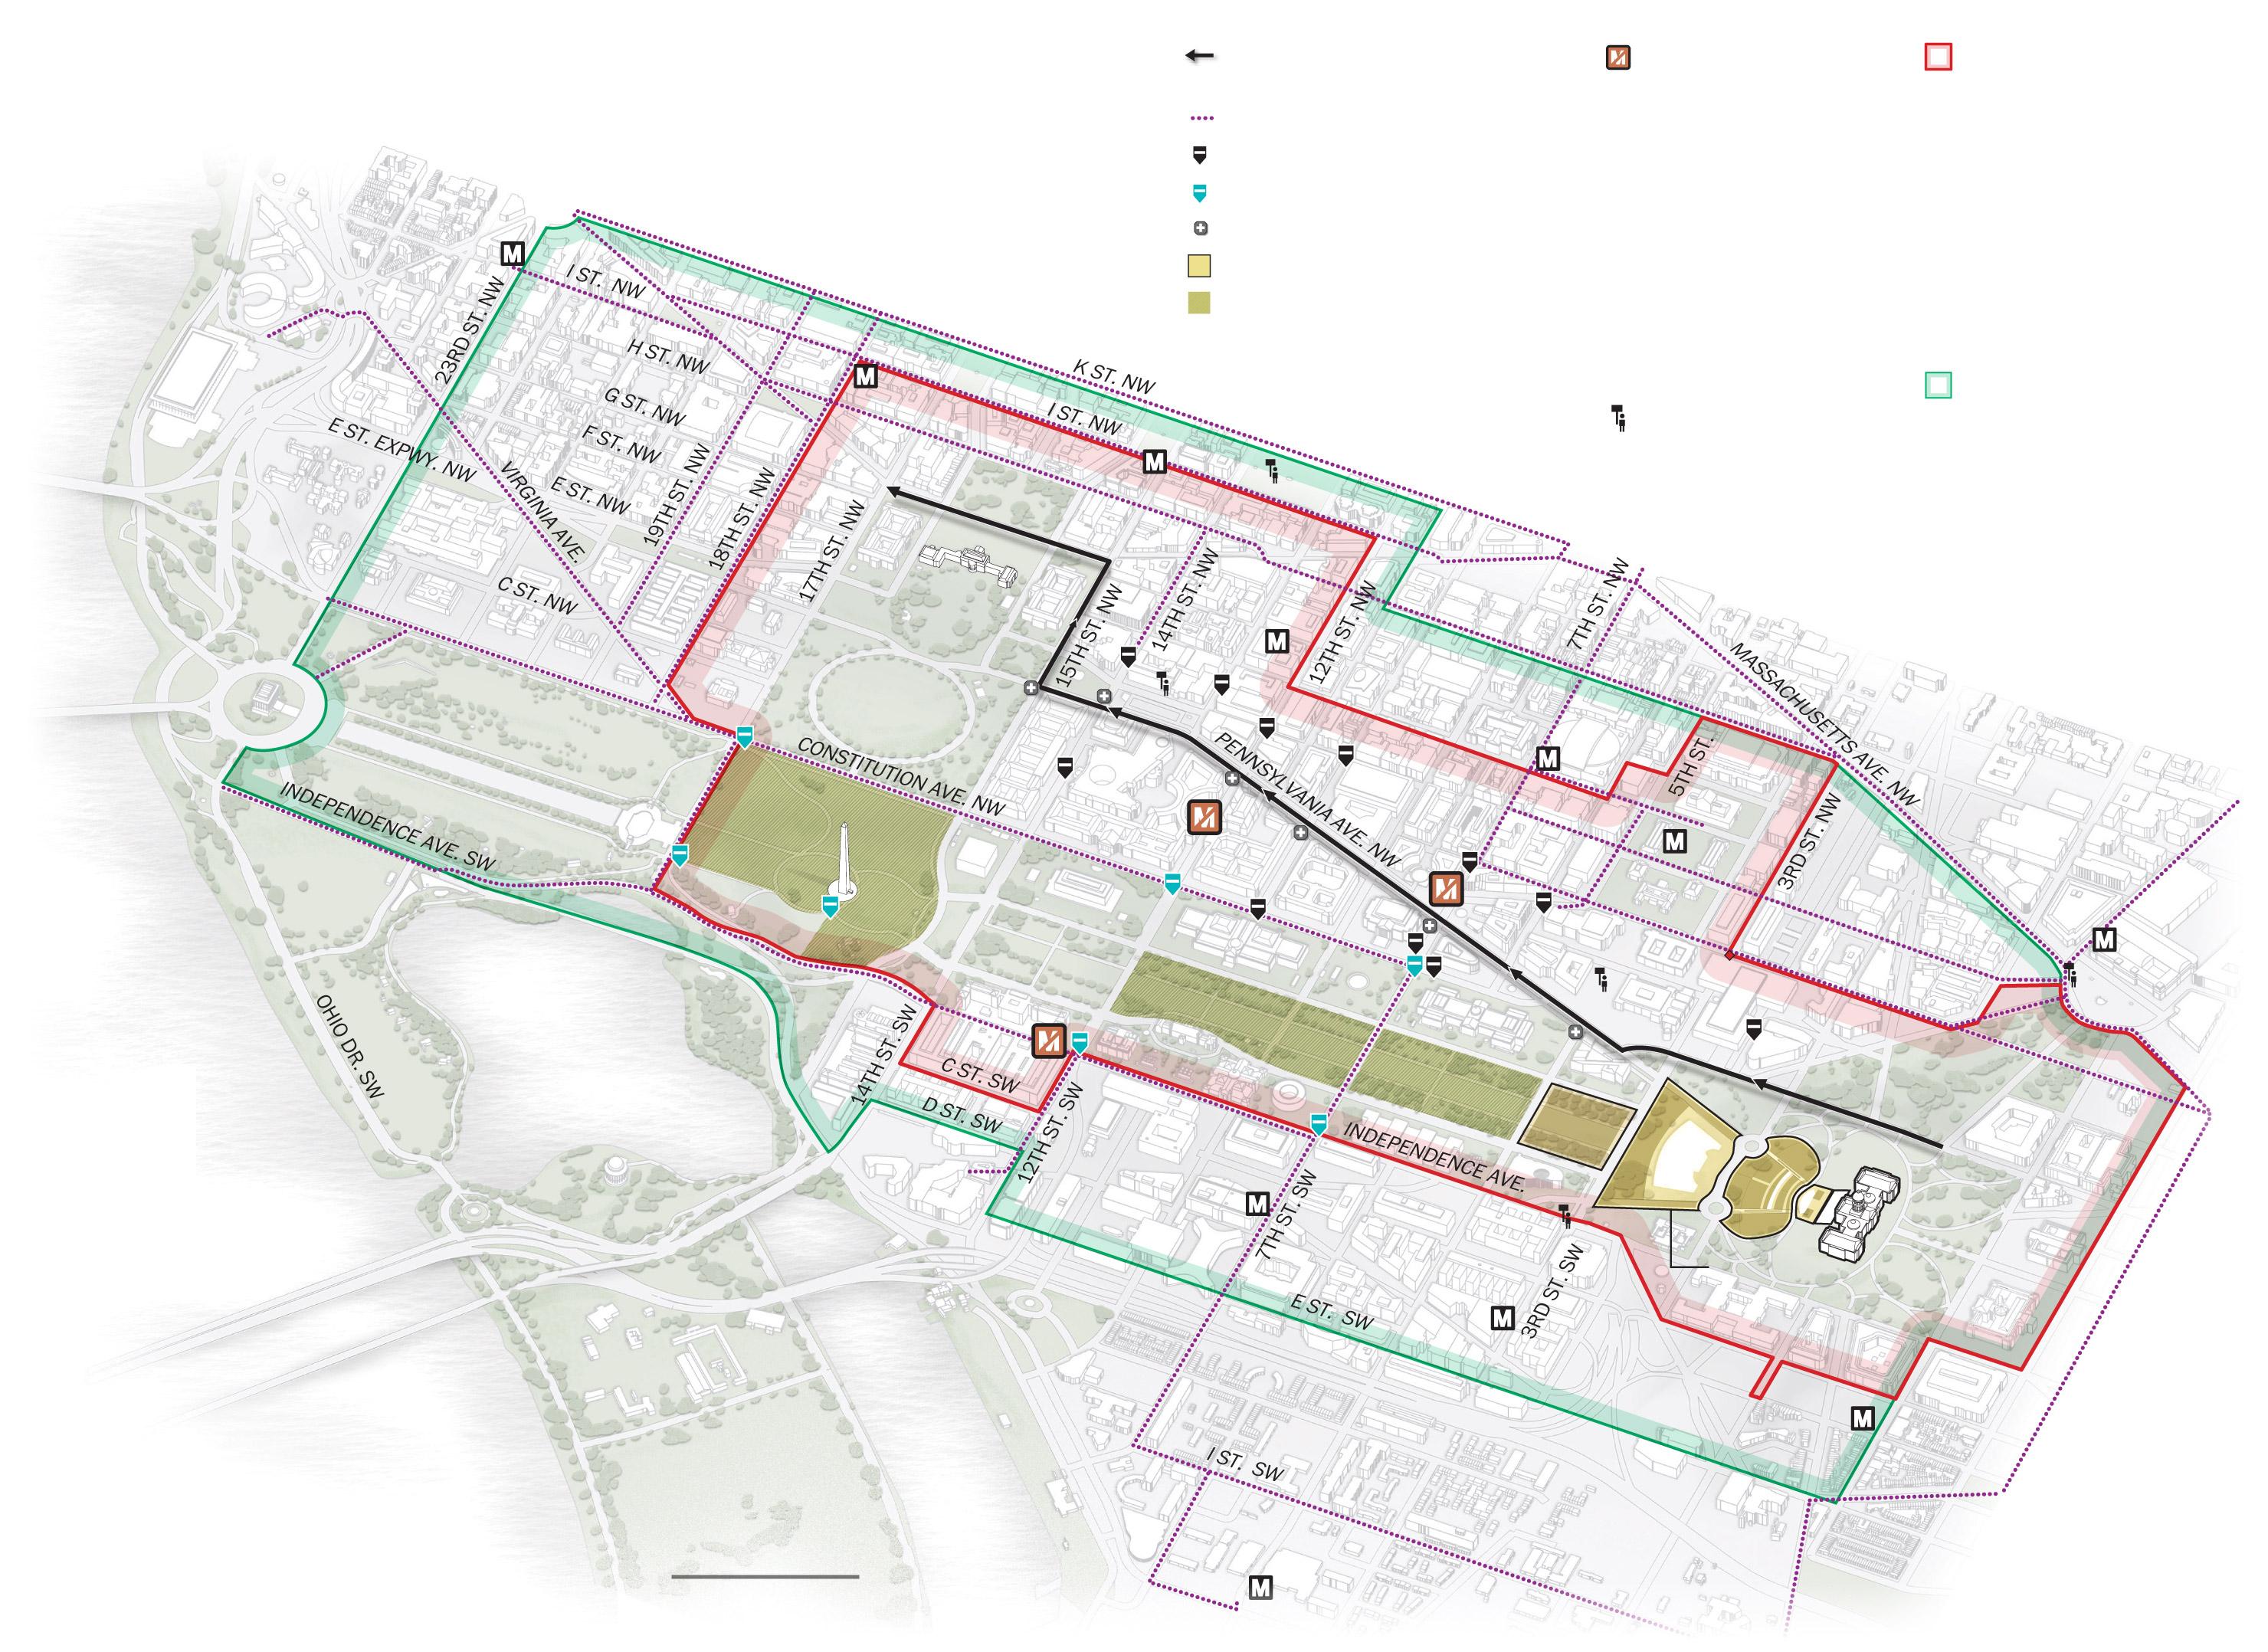 medium resolution of diagram of washington dc